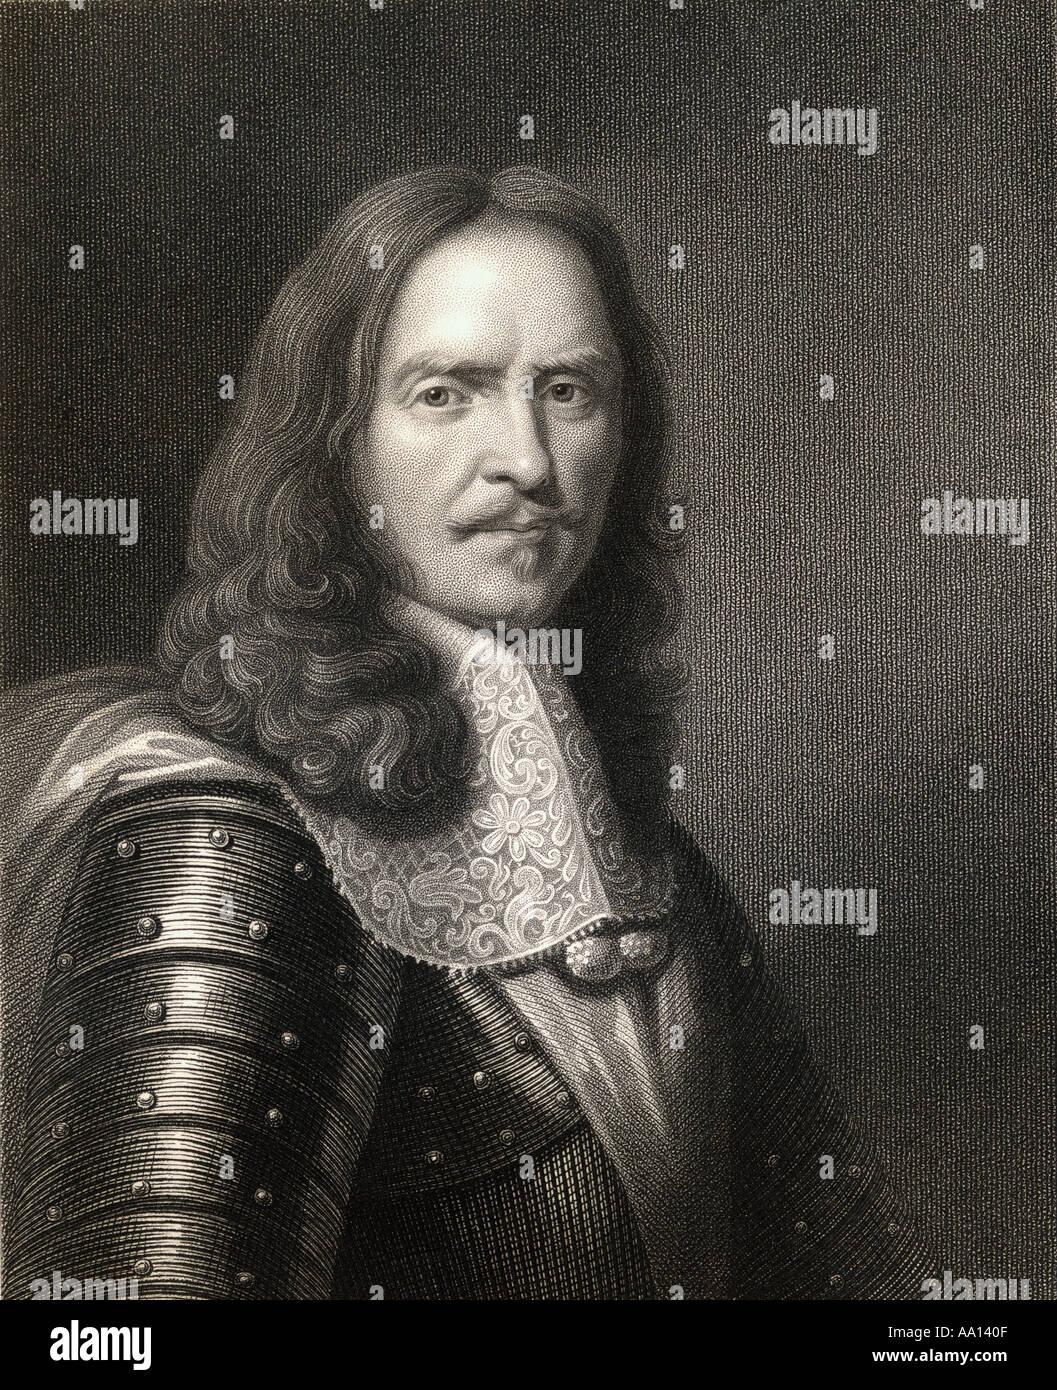 Henri de La Tour d'Auvergne, vicomte de Turenne, akaTurenne, 1611 - 1675. French military leader and Marshal General of France. - Stock Image